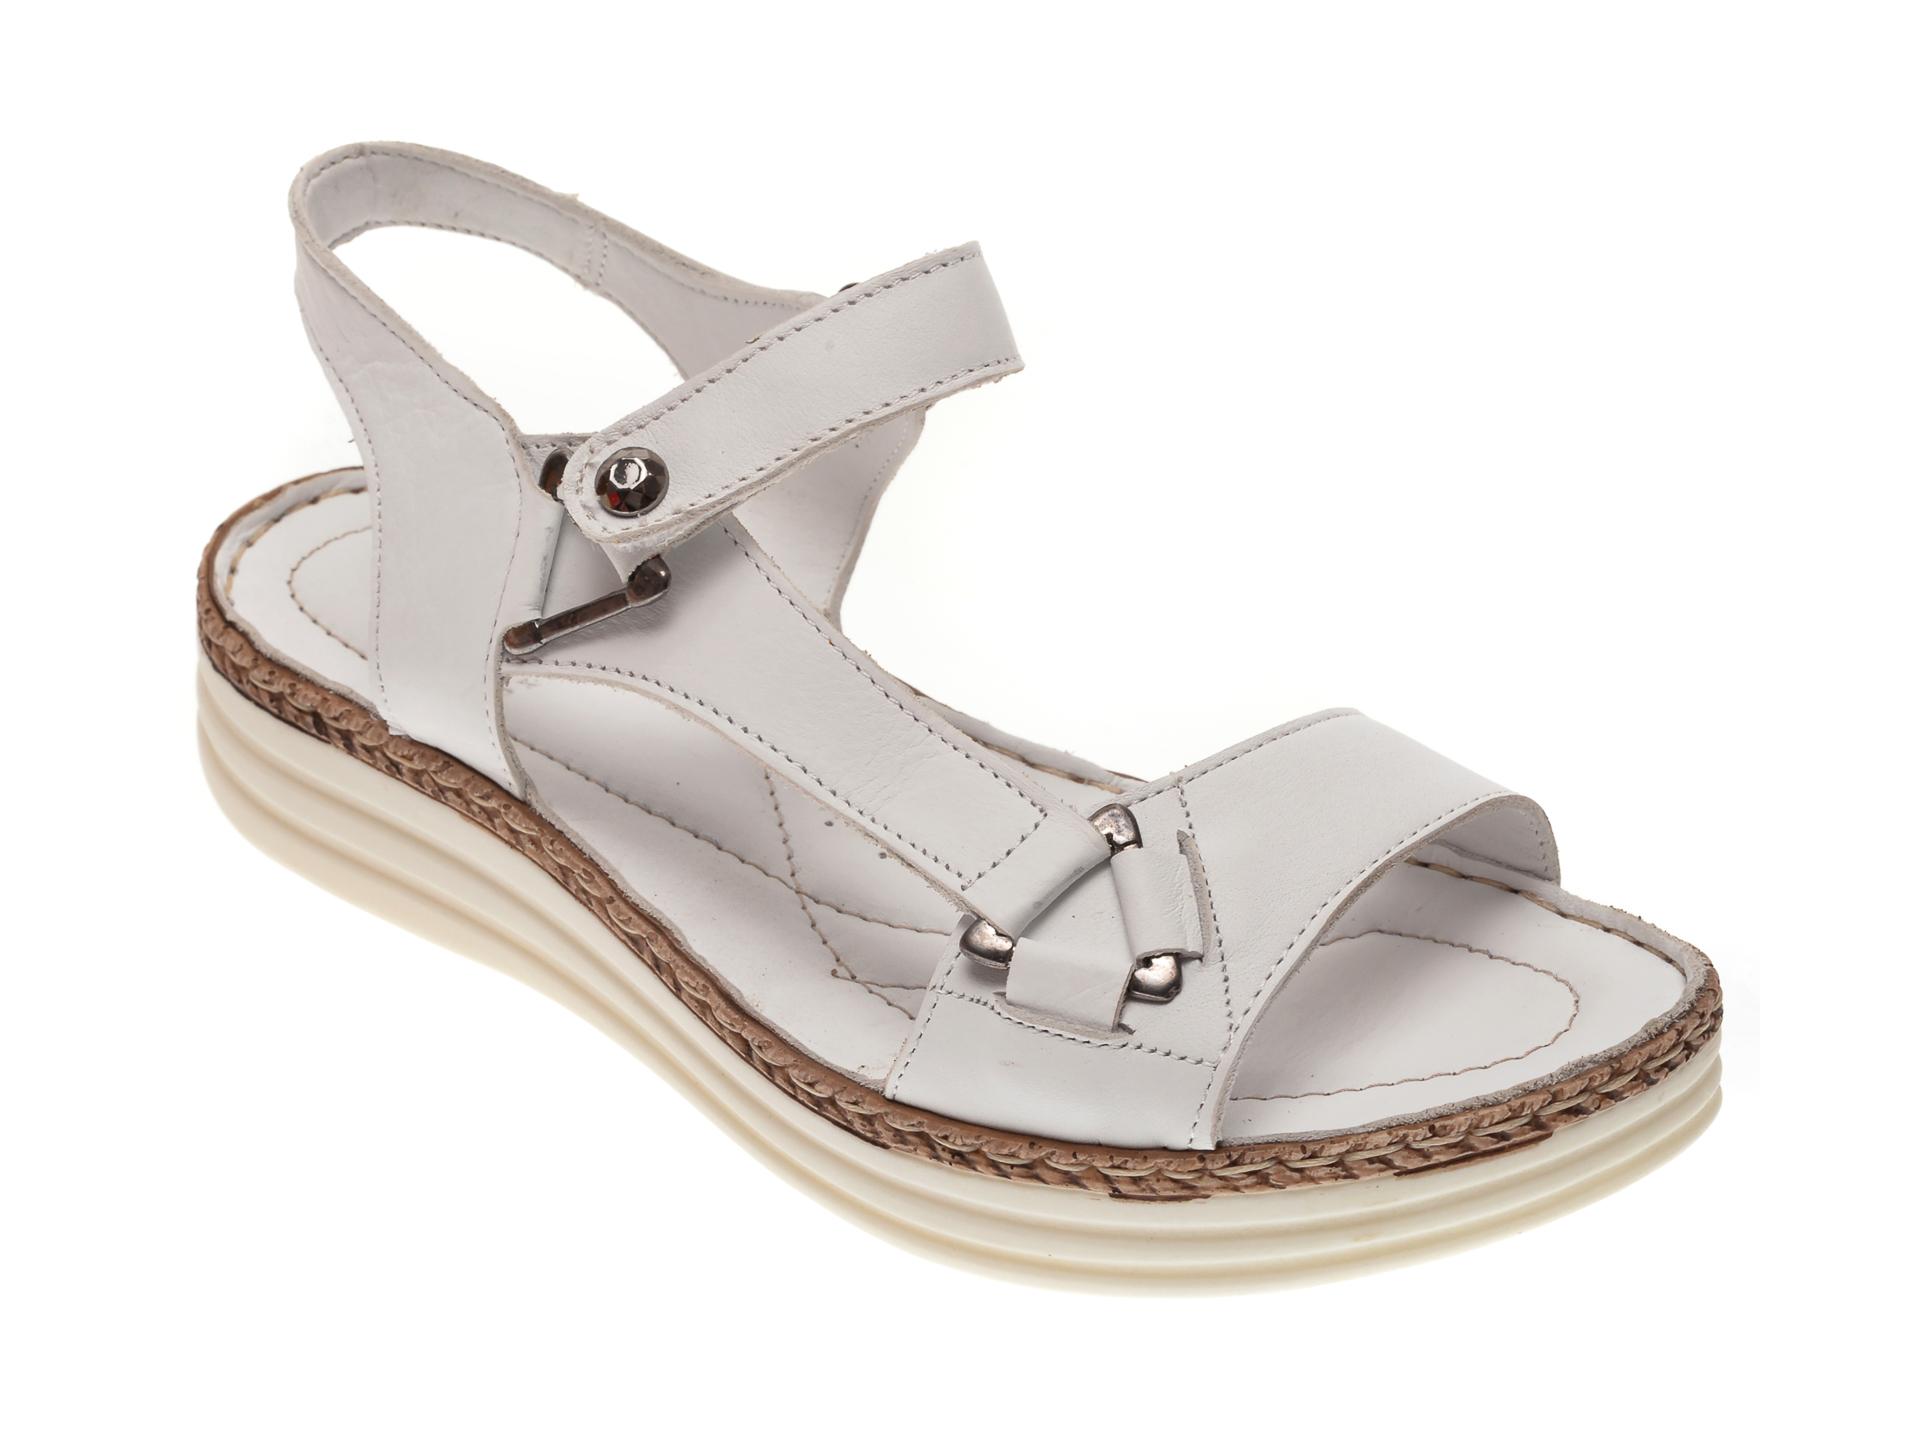 Sandale X TREND albe, 513, din piele naturala